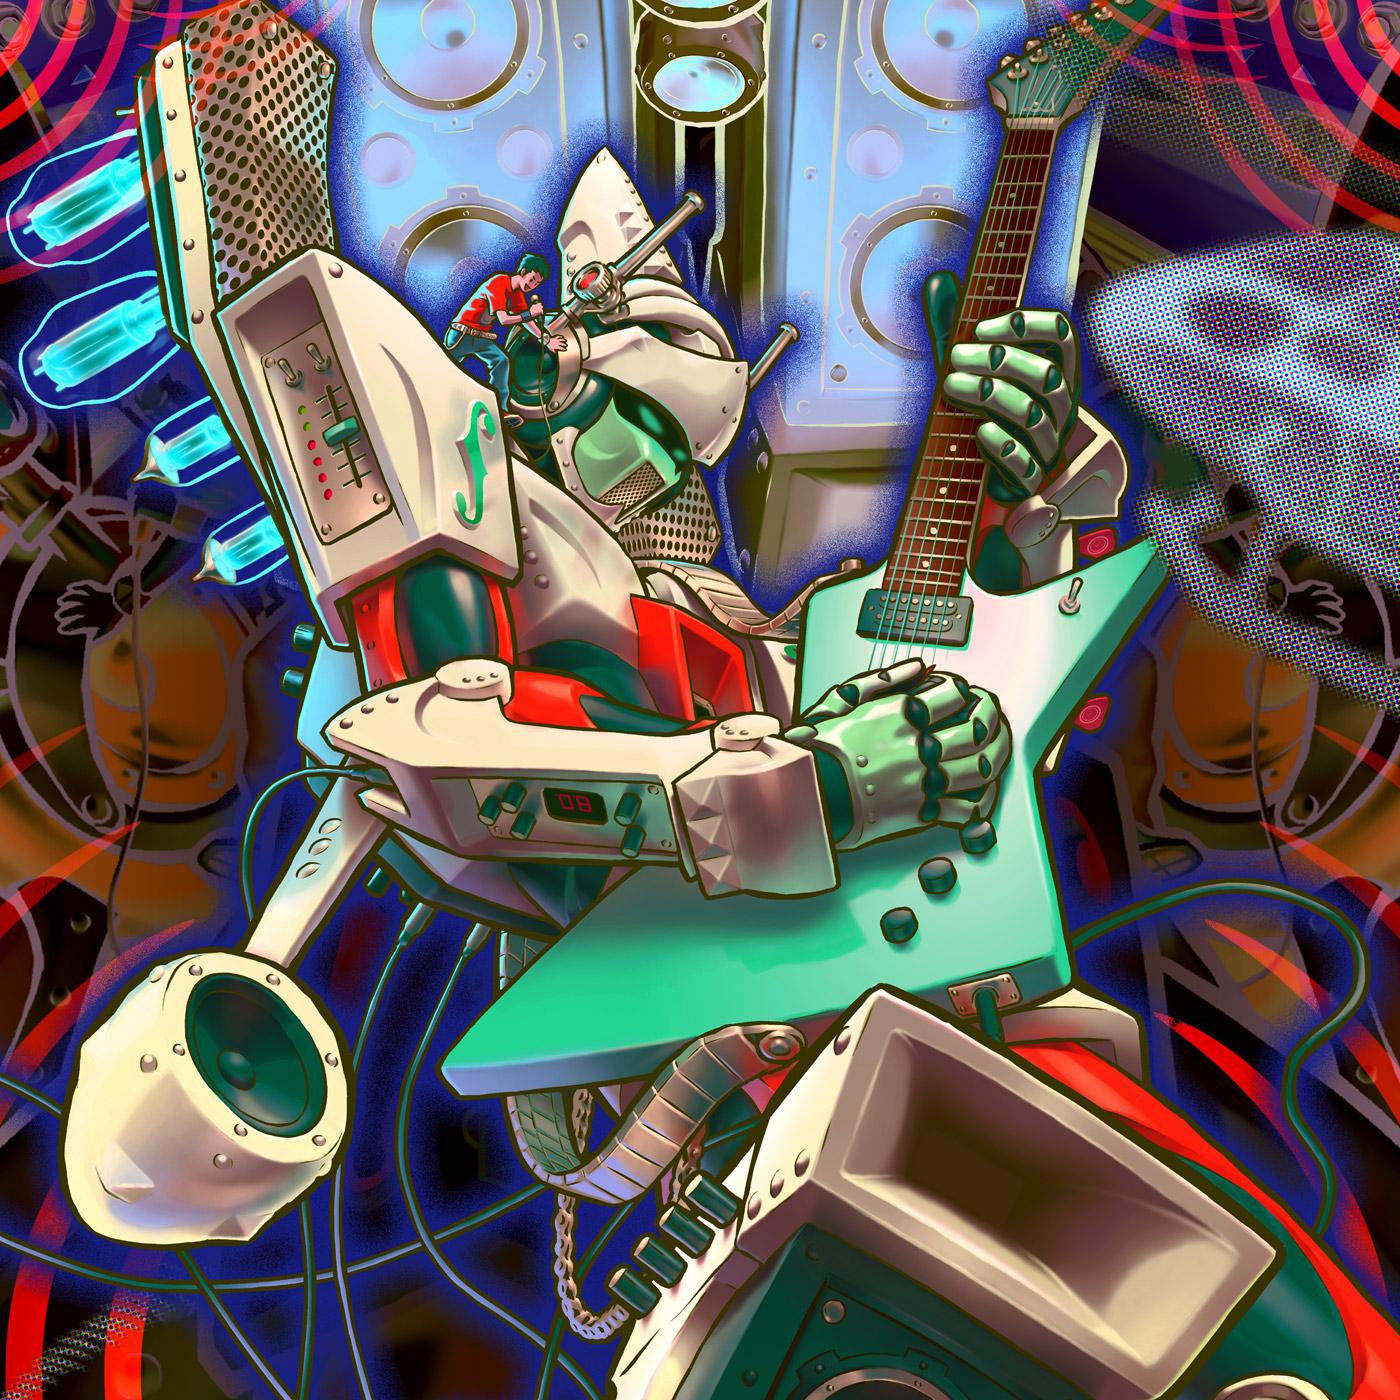 giant guitar robot speaker Amp rock bash sxsw Katakana japanese Guitar Pedal festival